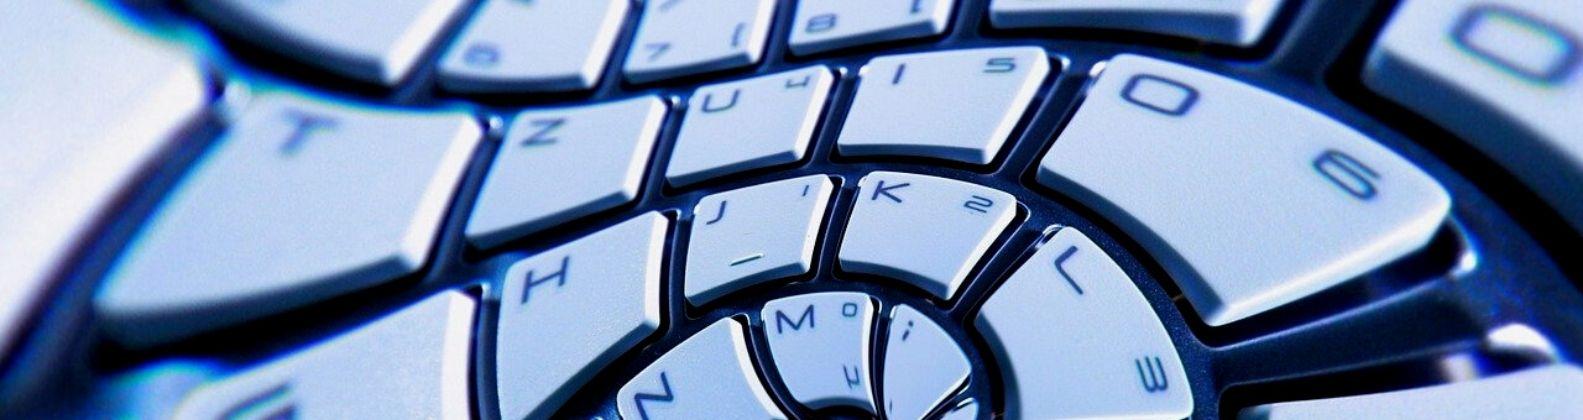 teclados ergonómicos